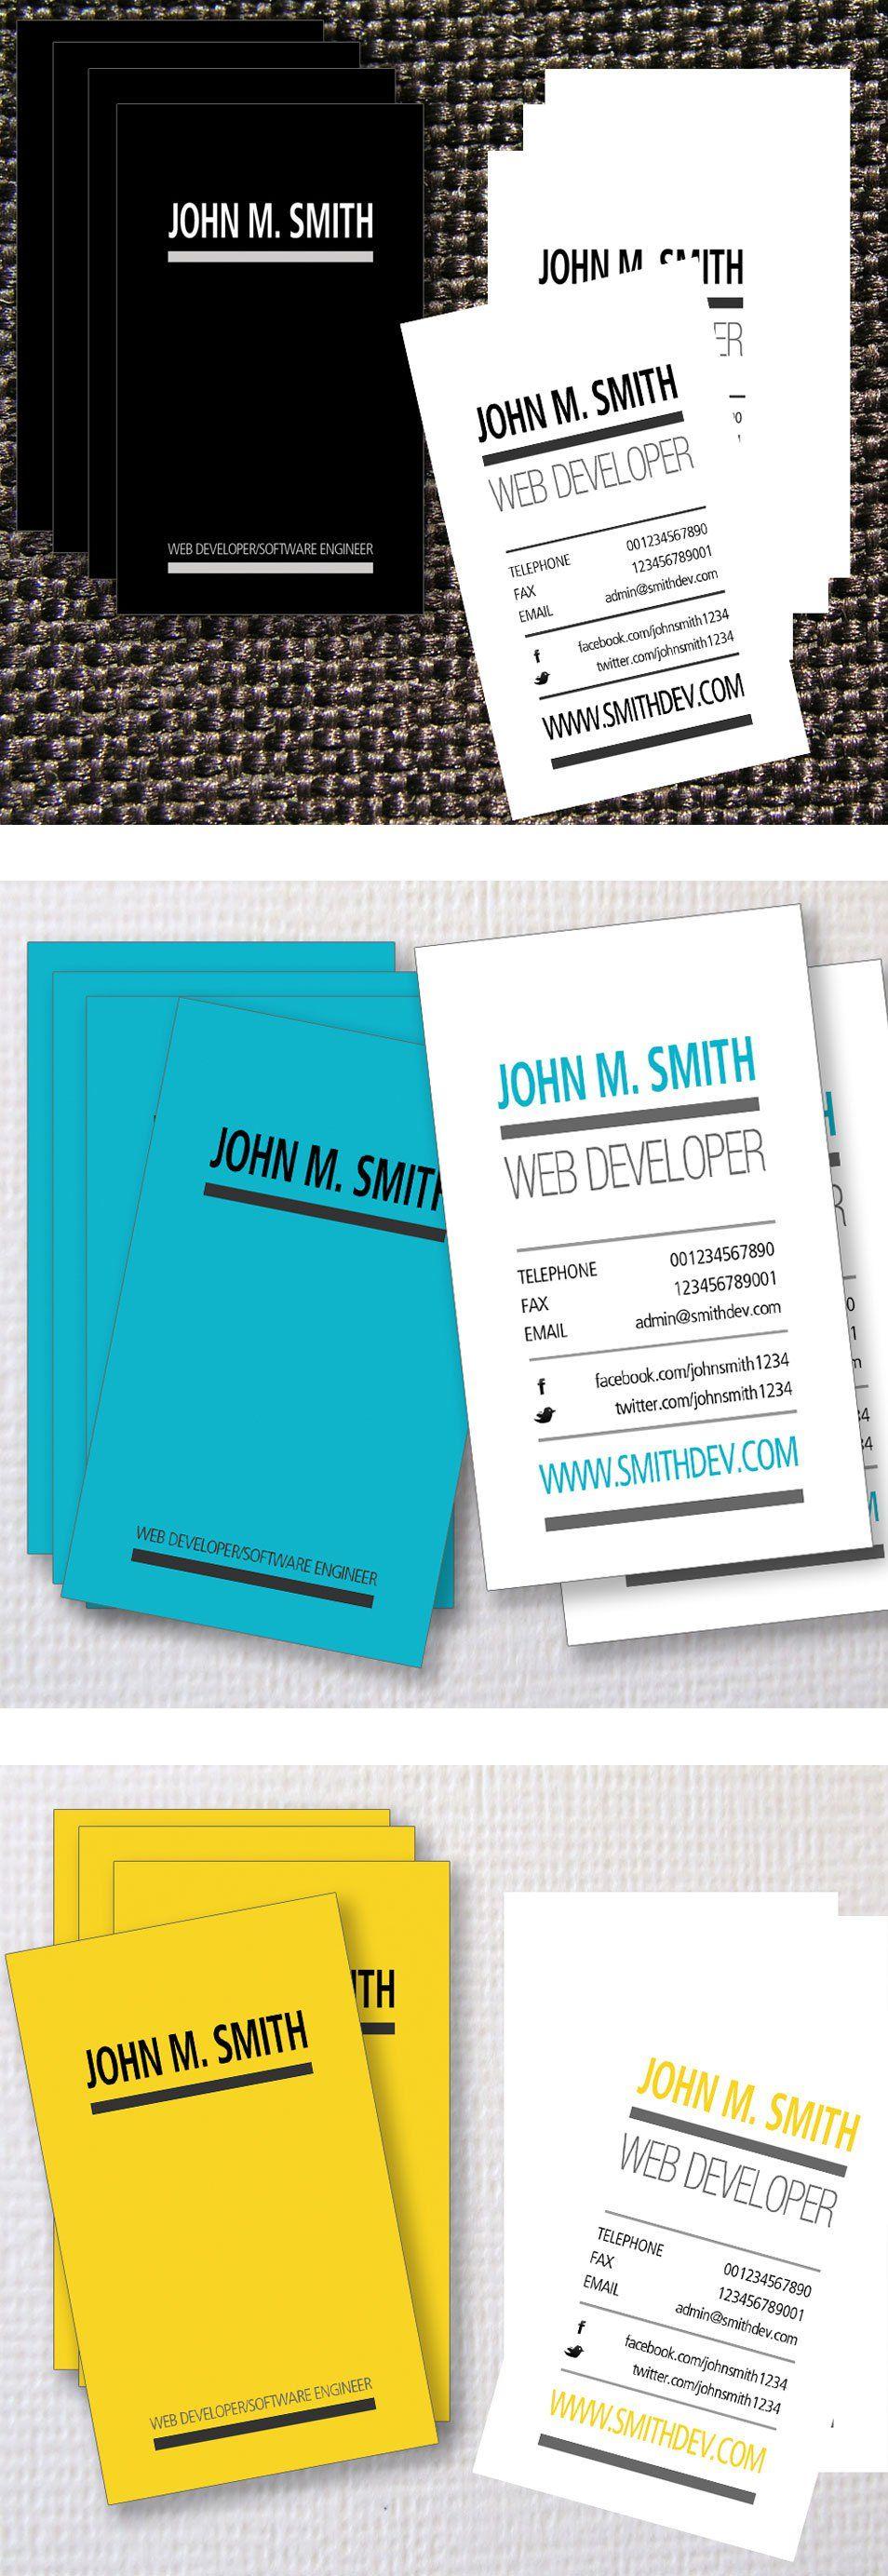 3 Typographic Web Developer Business Card Templates